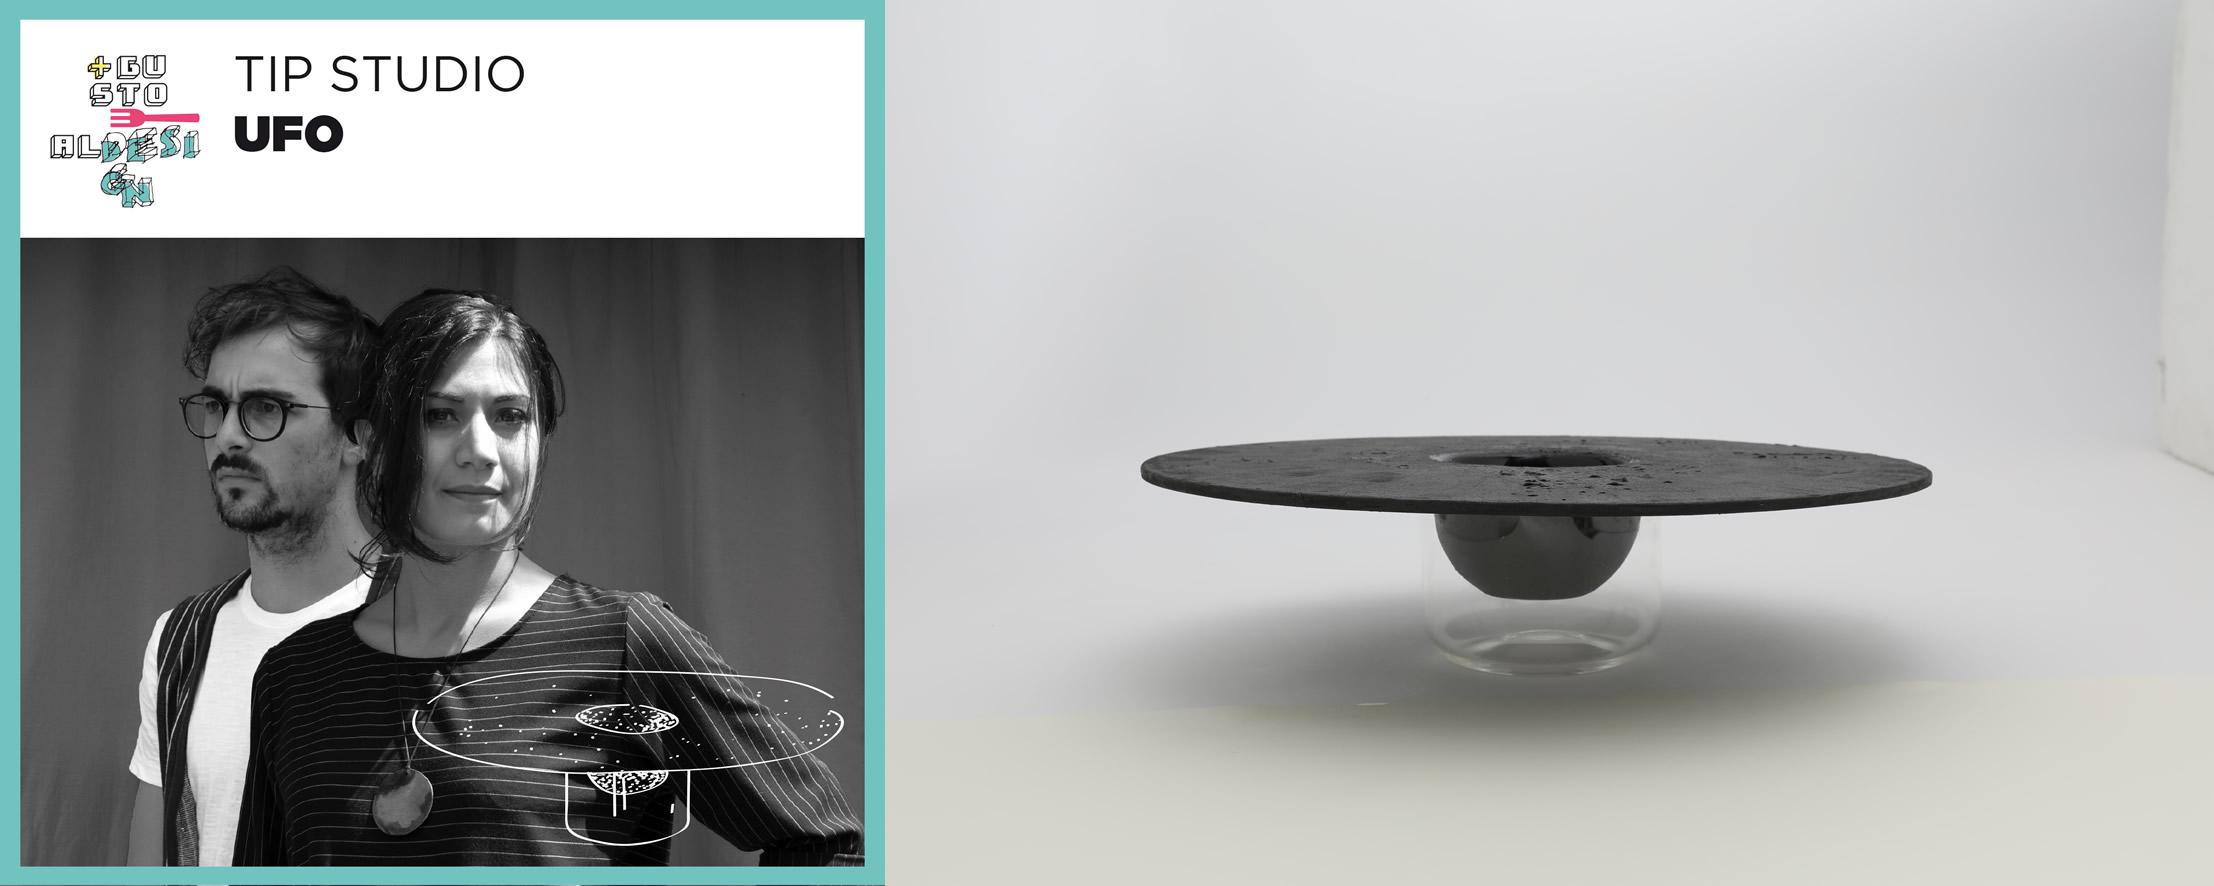 piugustoaldesign tip studio ufo